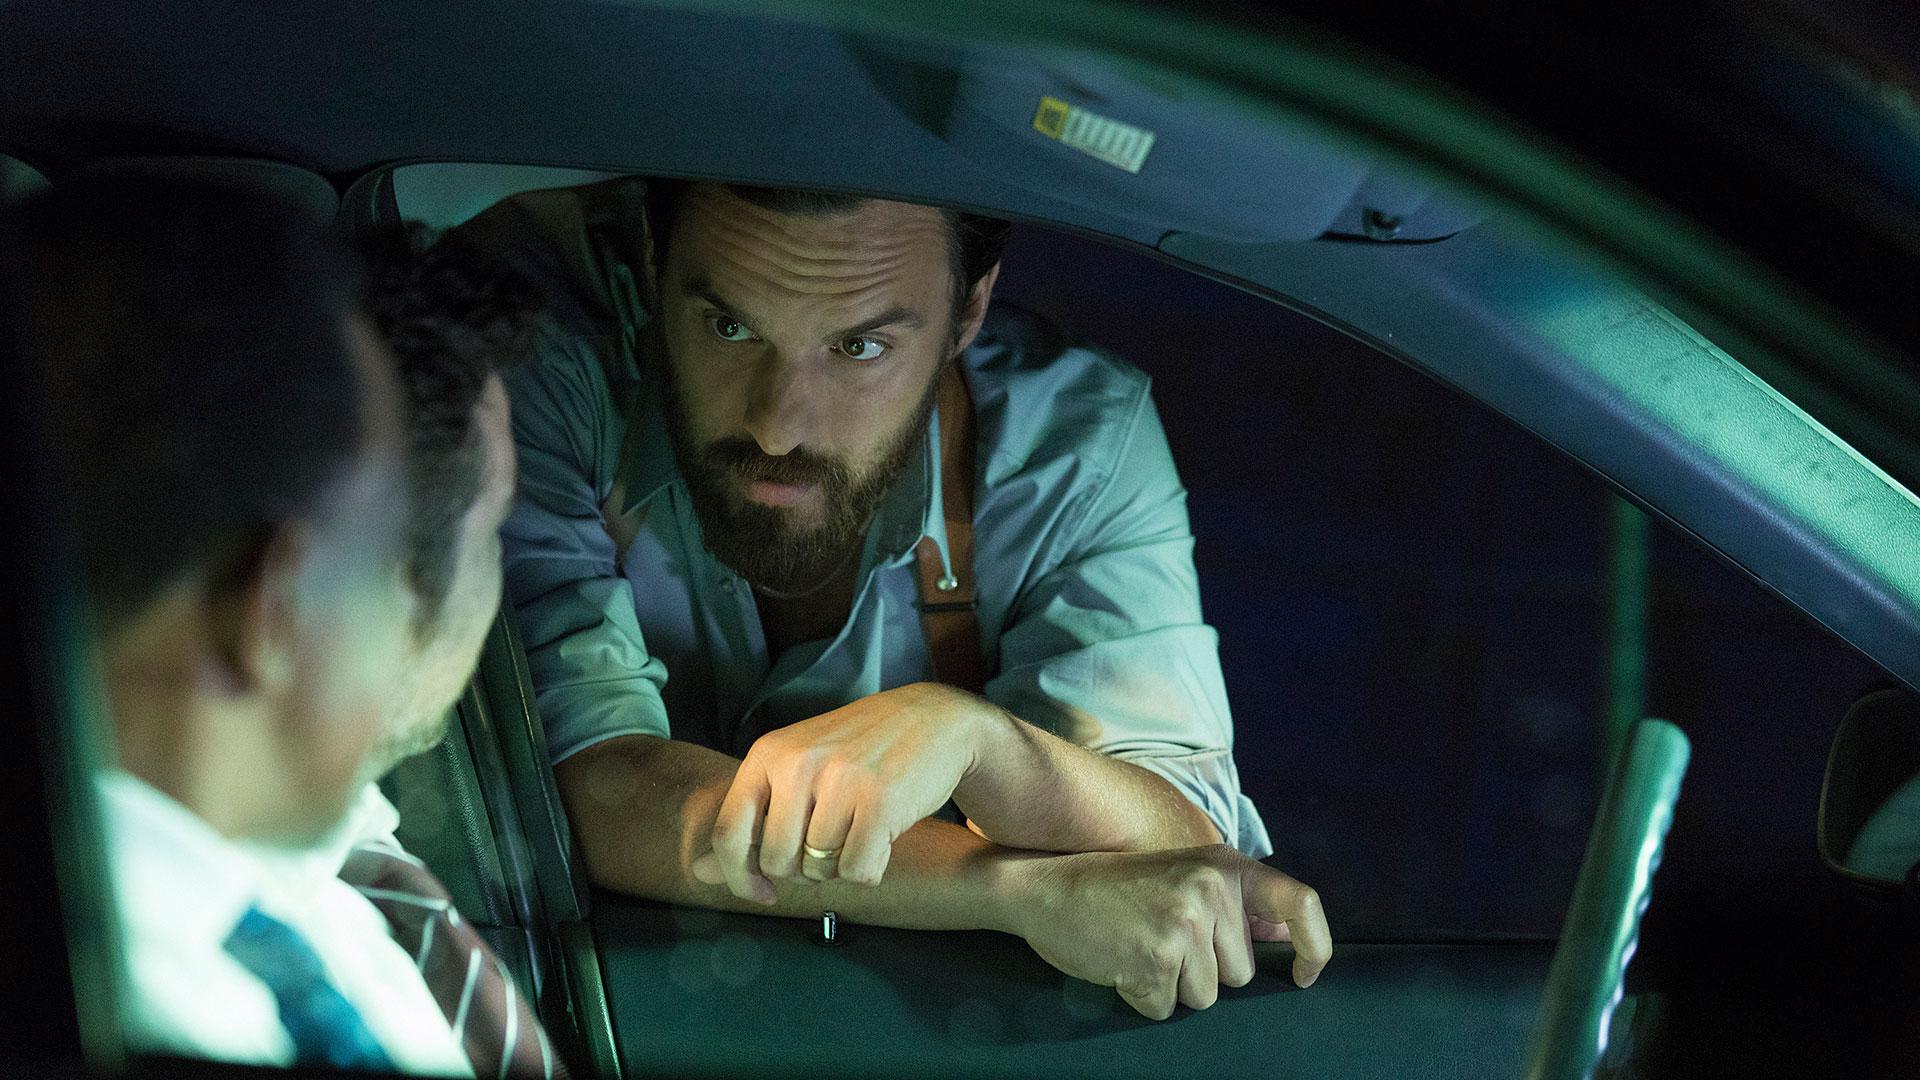 Jake Johnson as DEA Agent Josh Haldeman